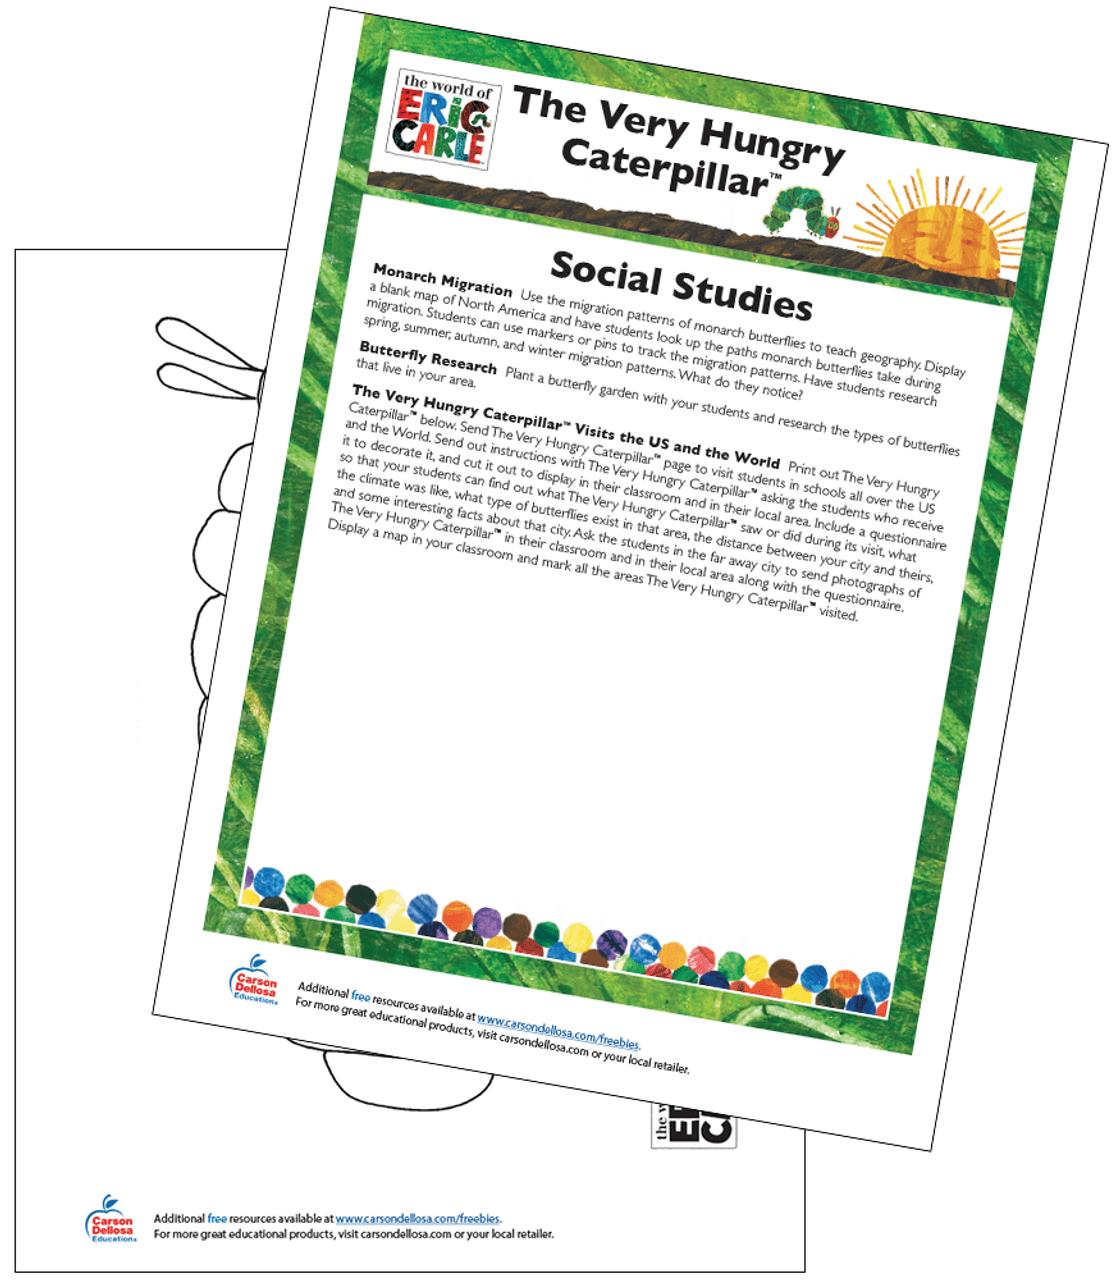 medium resolution of The Very Hungry Caterpillar Social Studies Activity Free Printable   Carson  Dellosa